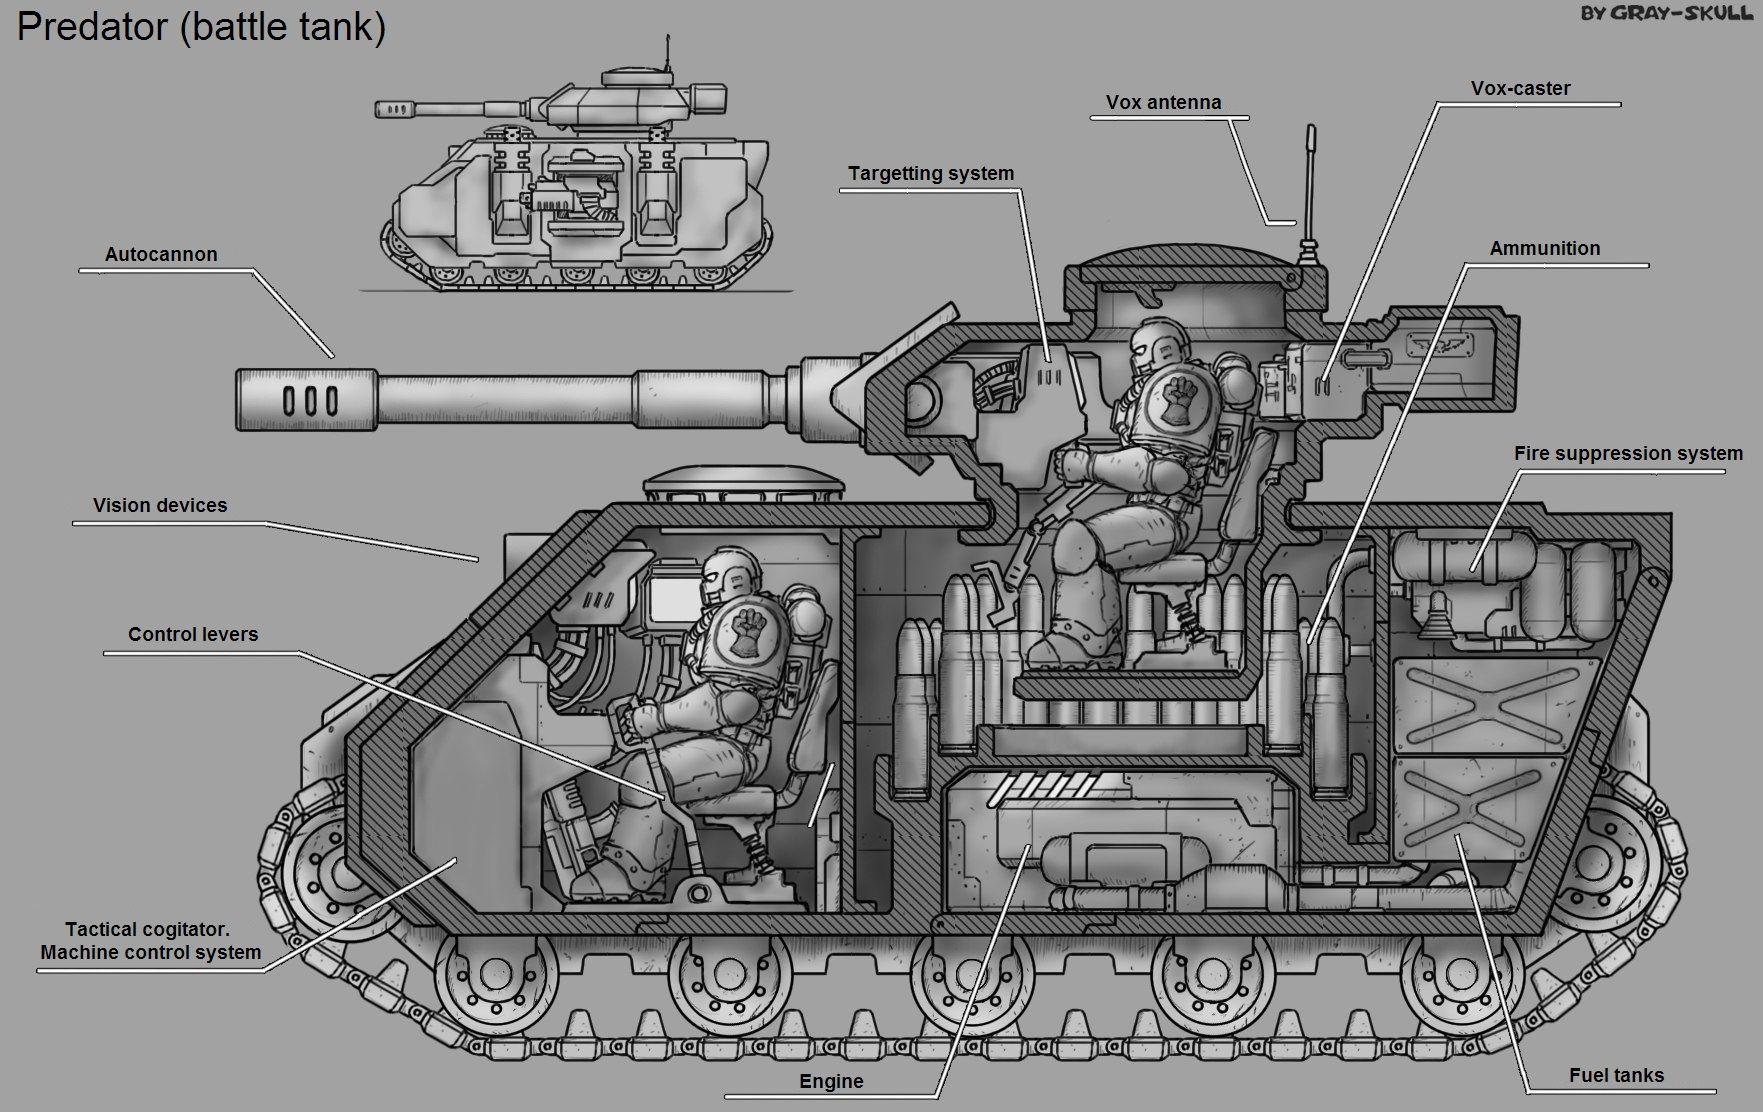 Warhammer Predator Battle Tank Art By Gray Skull